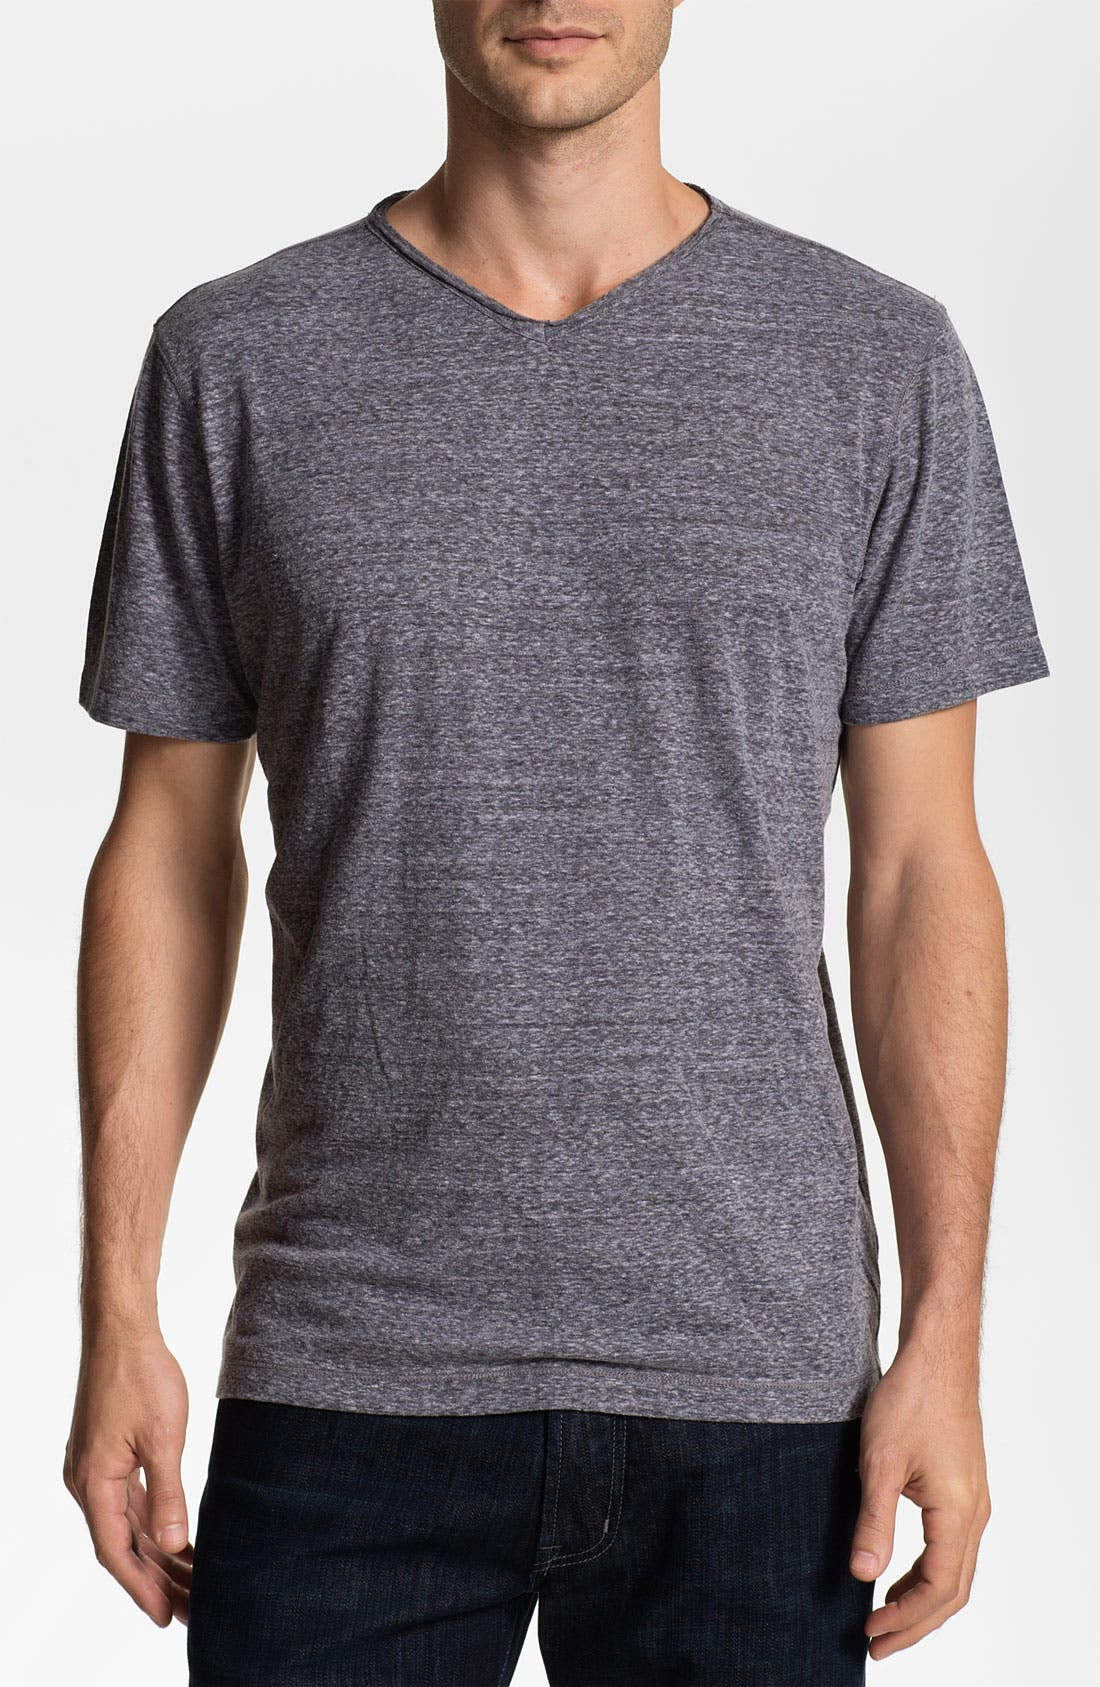 Alternate Image 1 Selected - Daniel Buchler Heathered Cotton Blend V-Neck T-Shirt